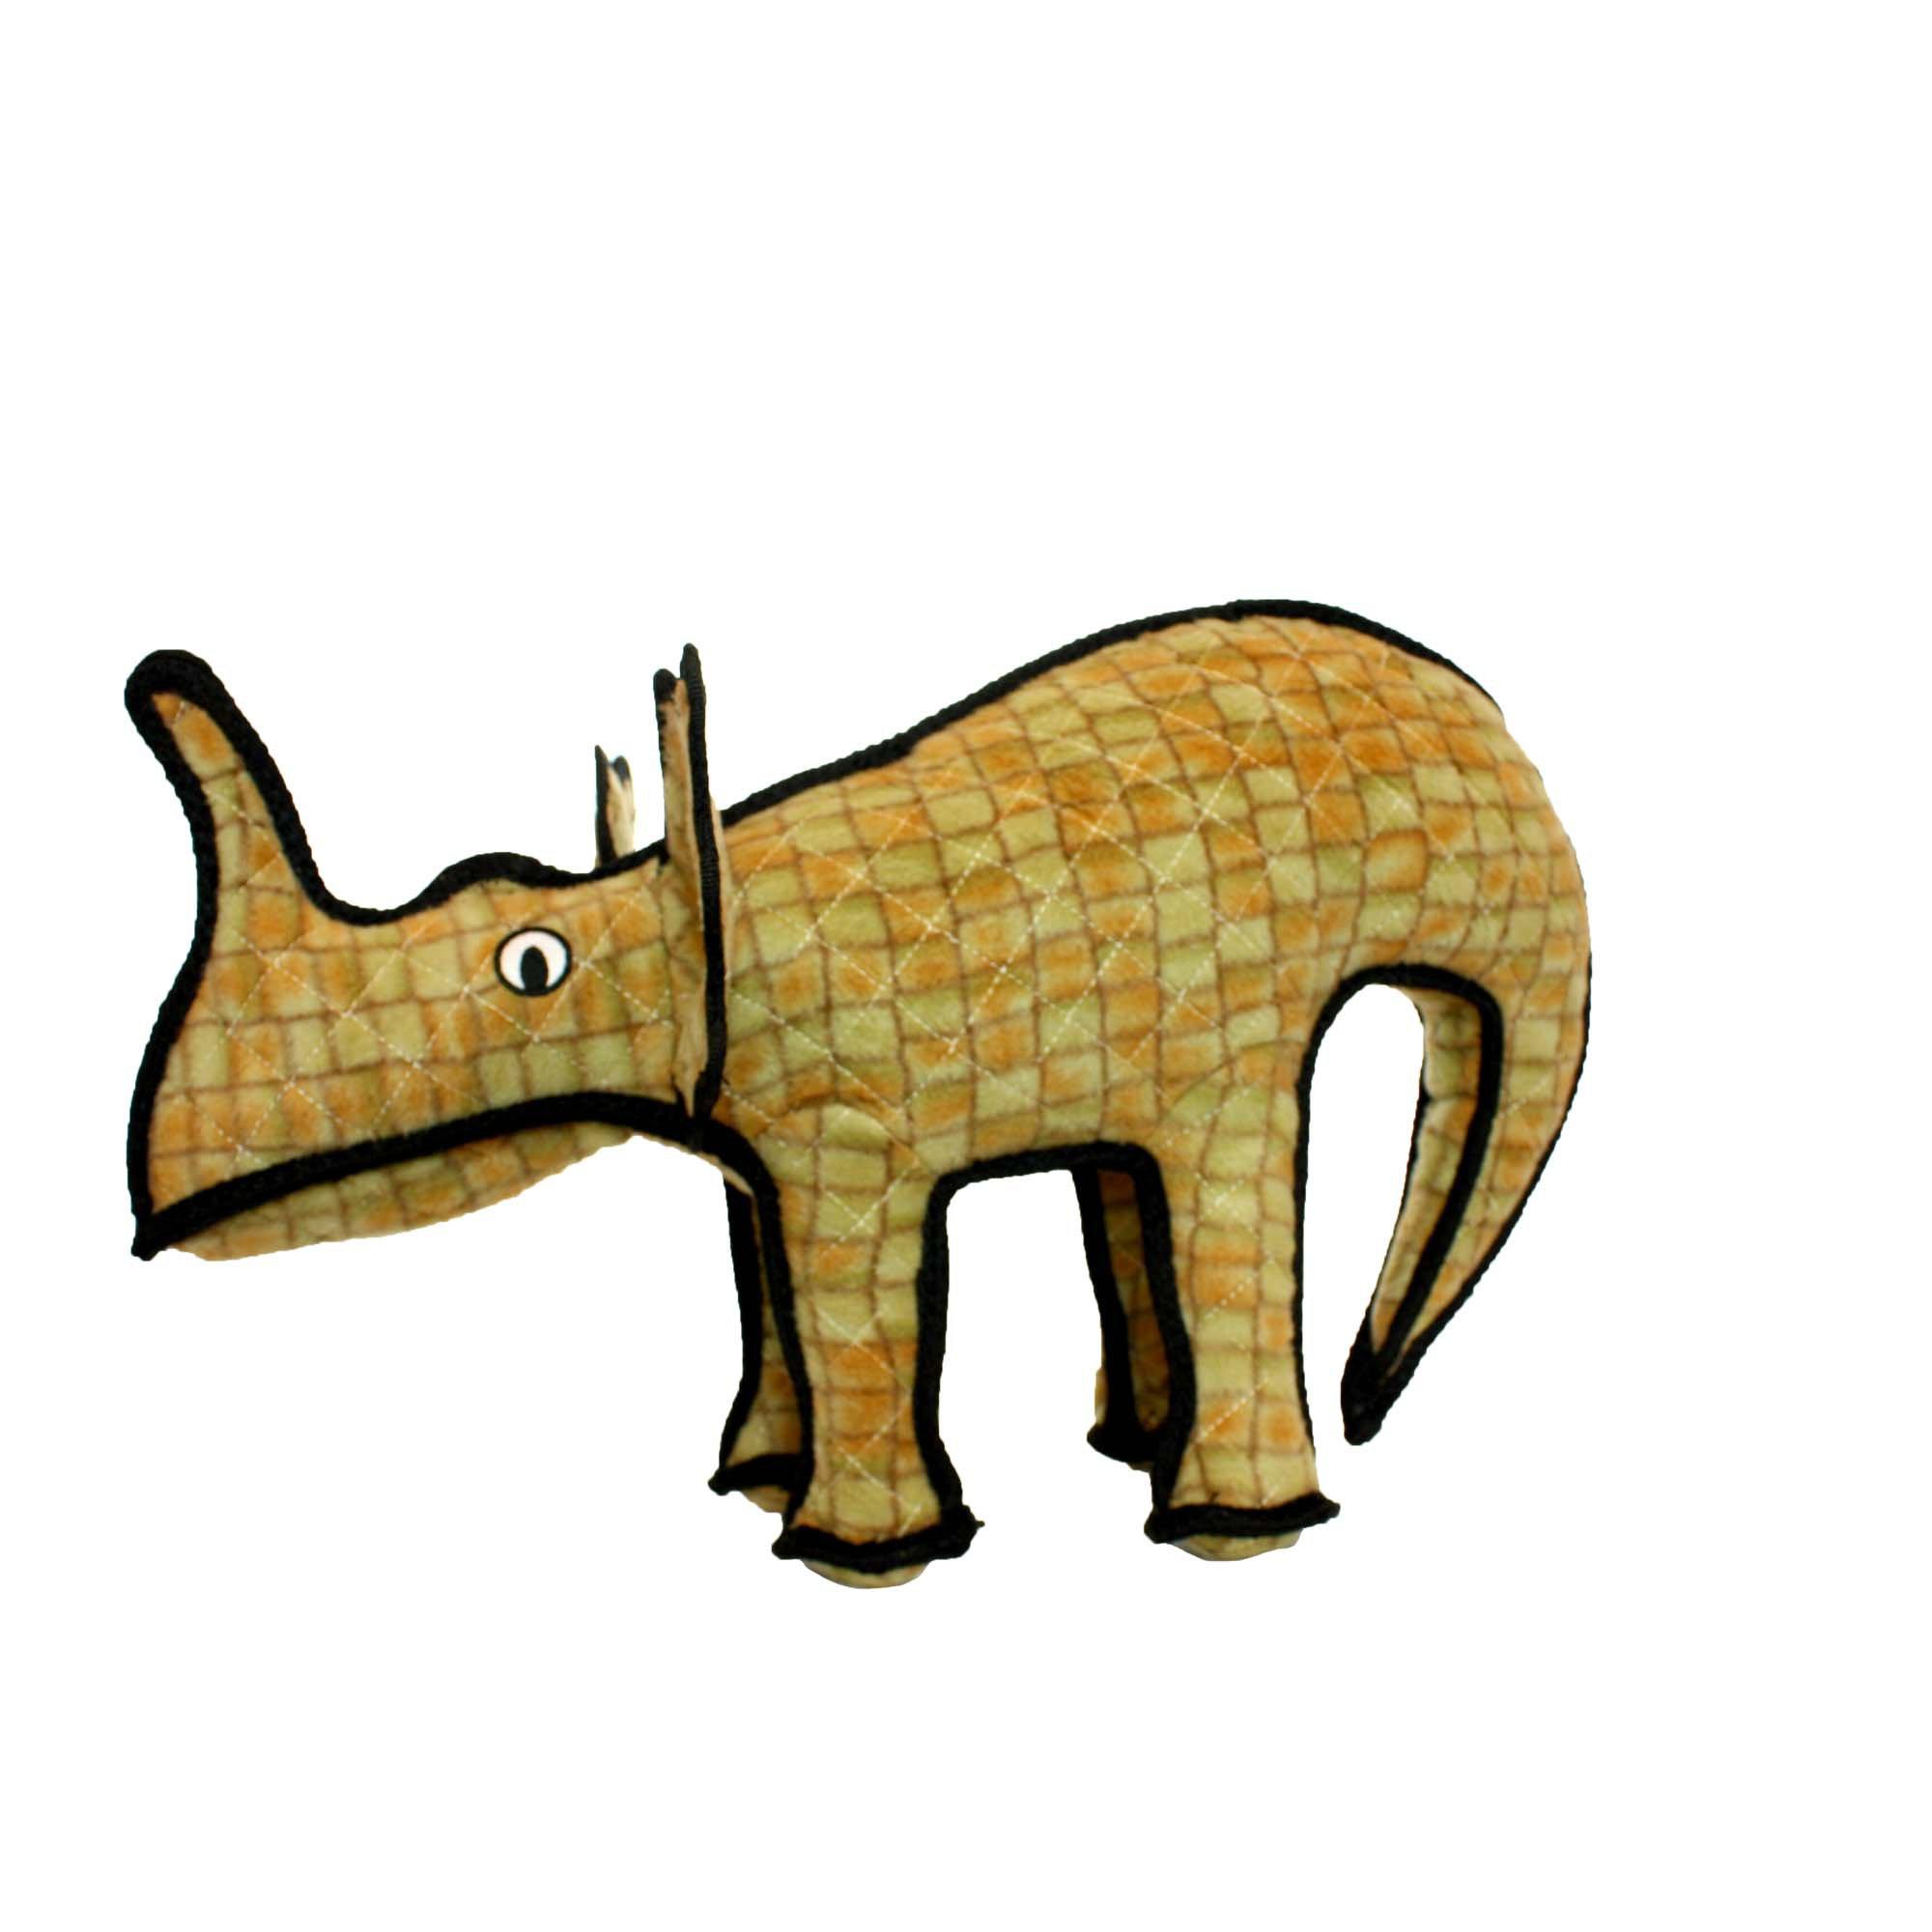 VIP Products Ultimate Mooseasaurus Dinosaur Tuffy's Dog Toy